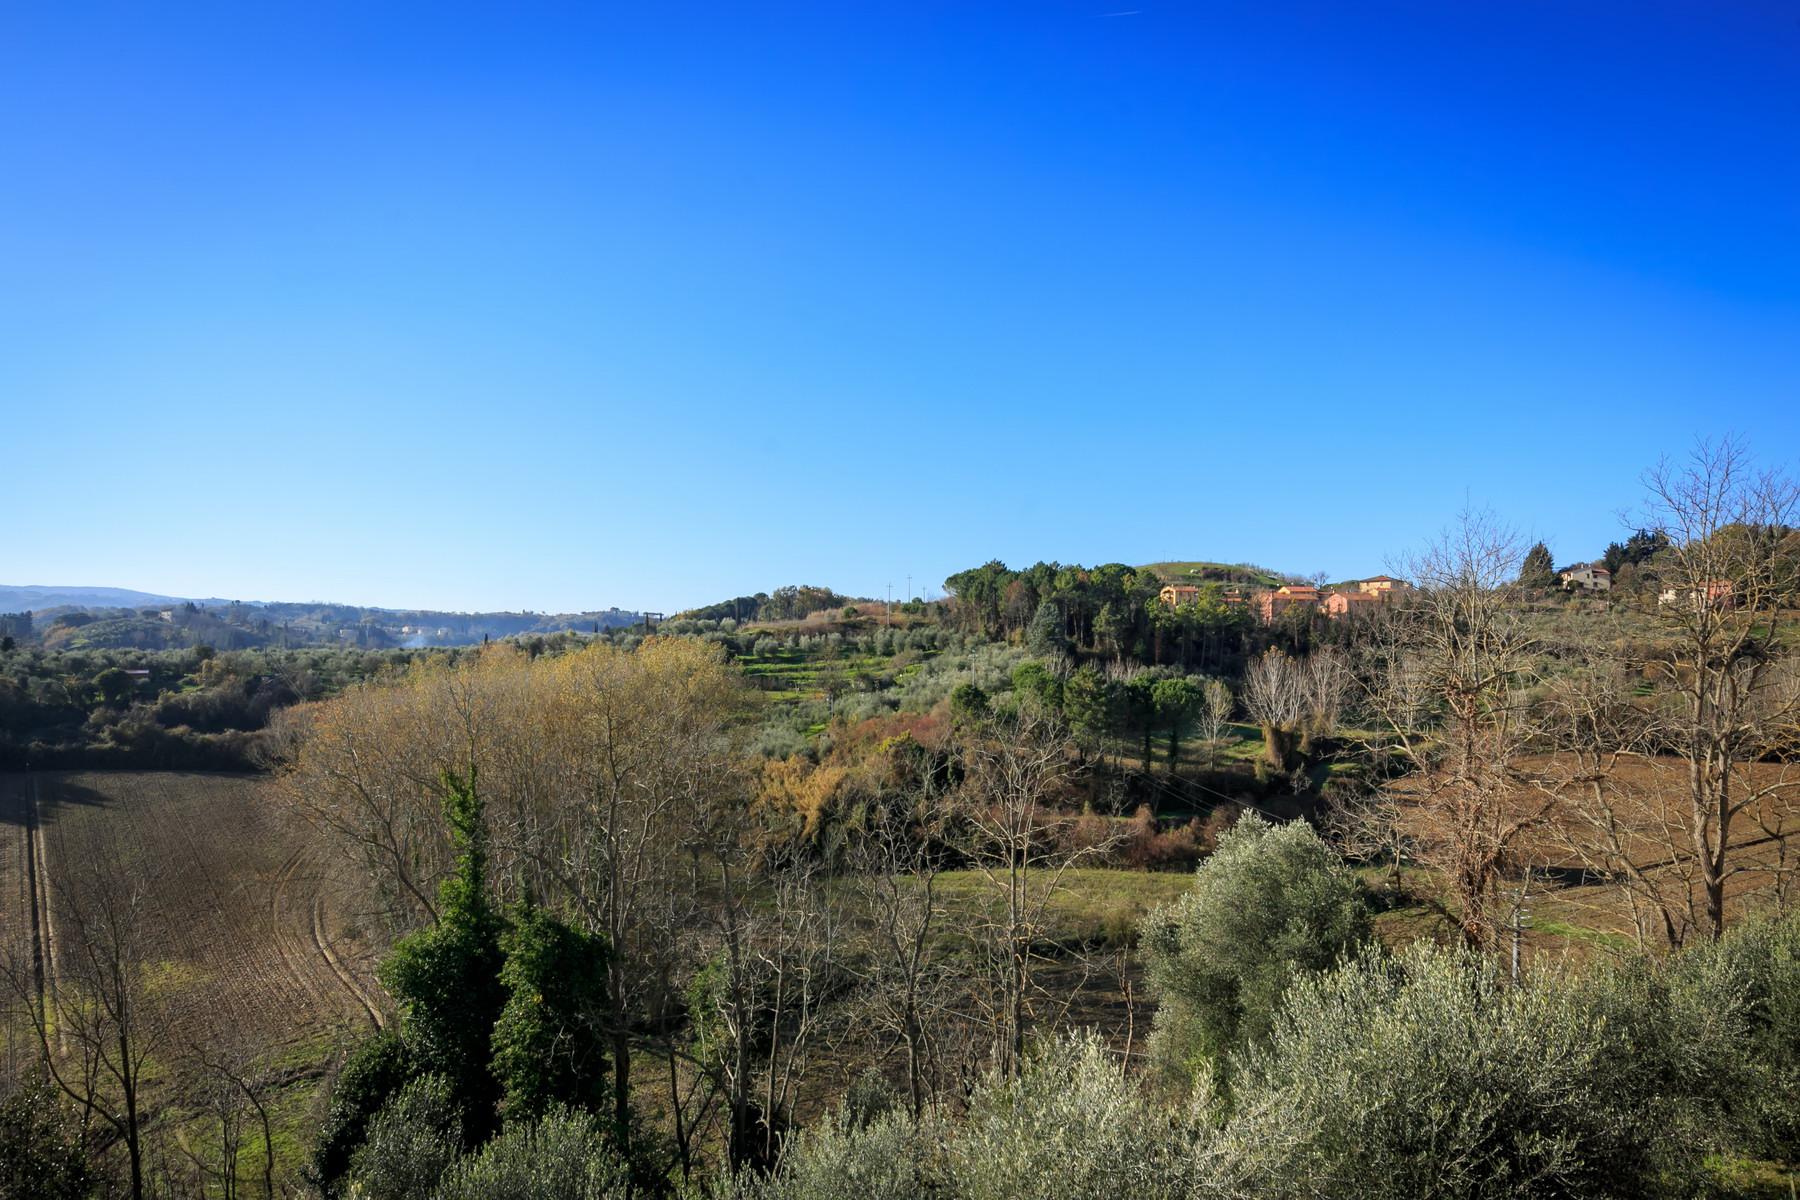 Villa in Vendita a Casciana Terme Lari: 5 locali, 550 mq - Foto 13